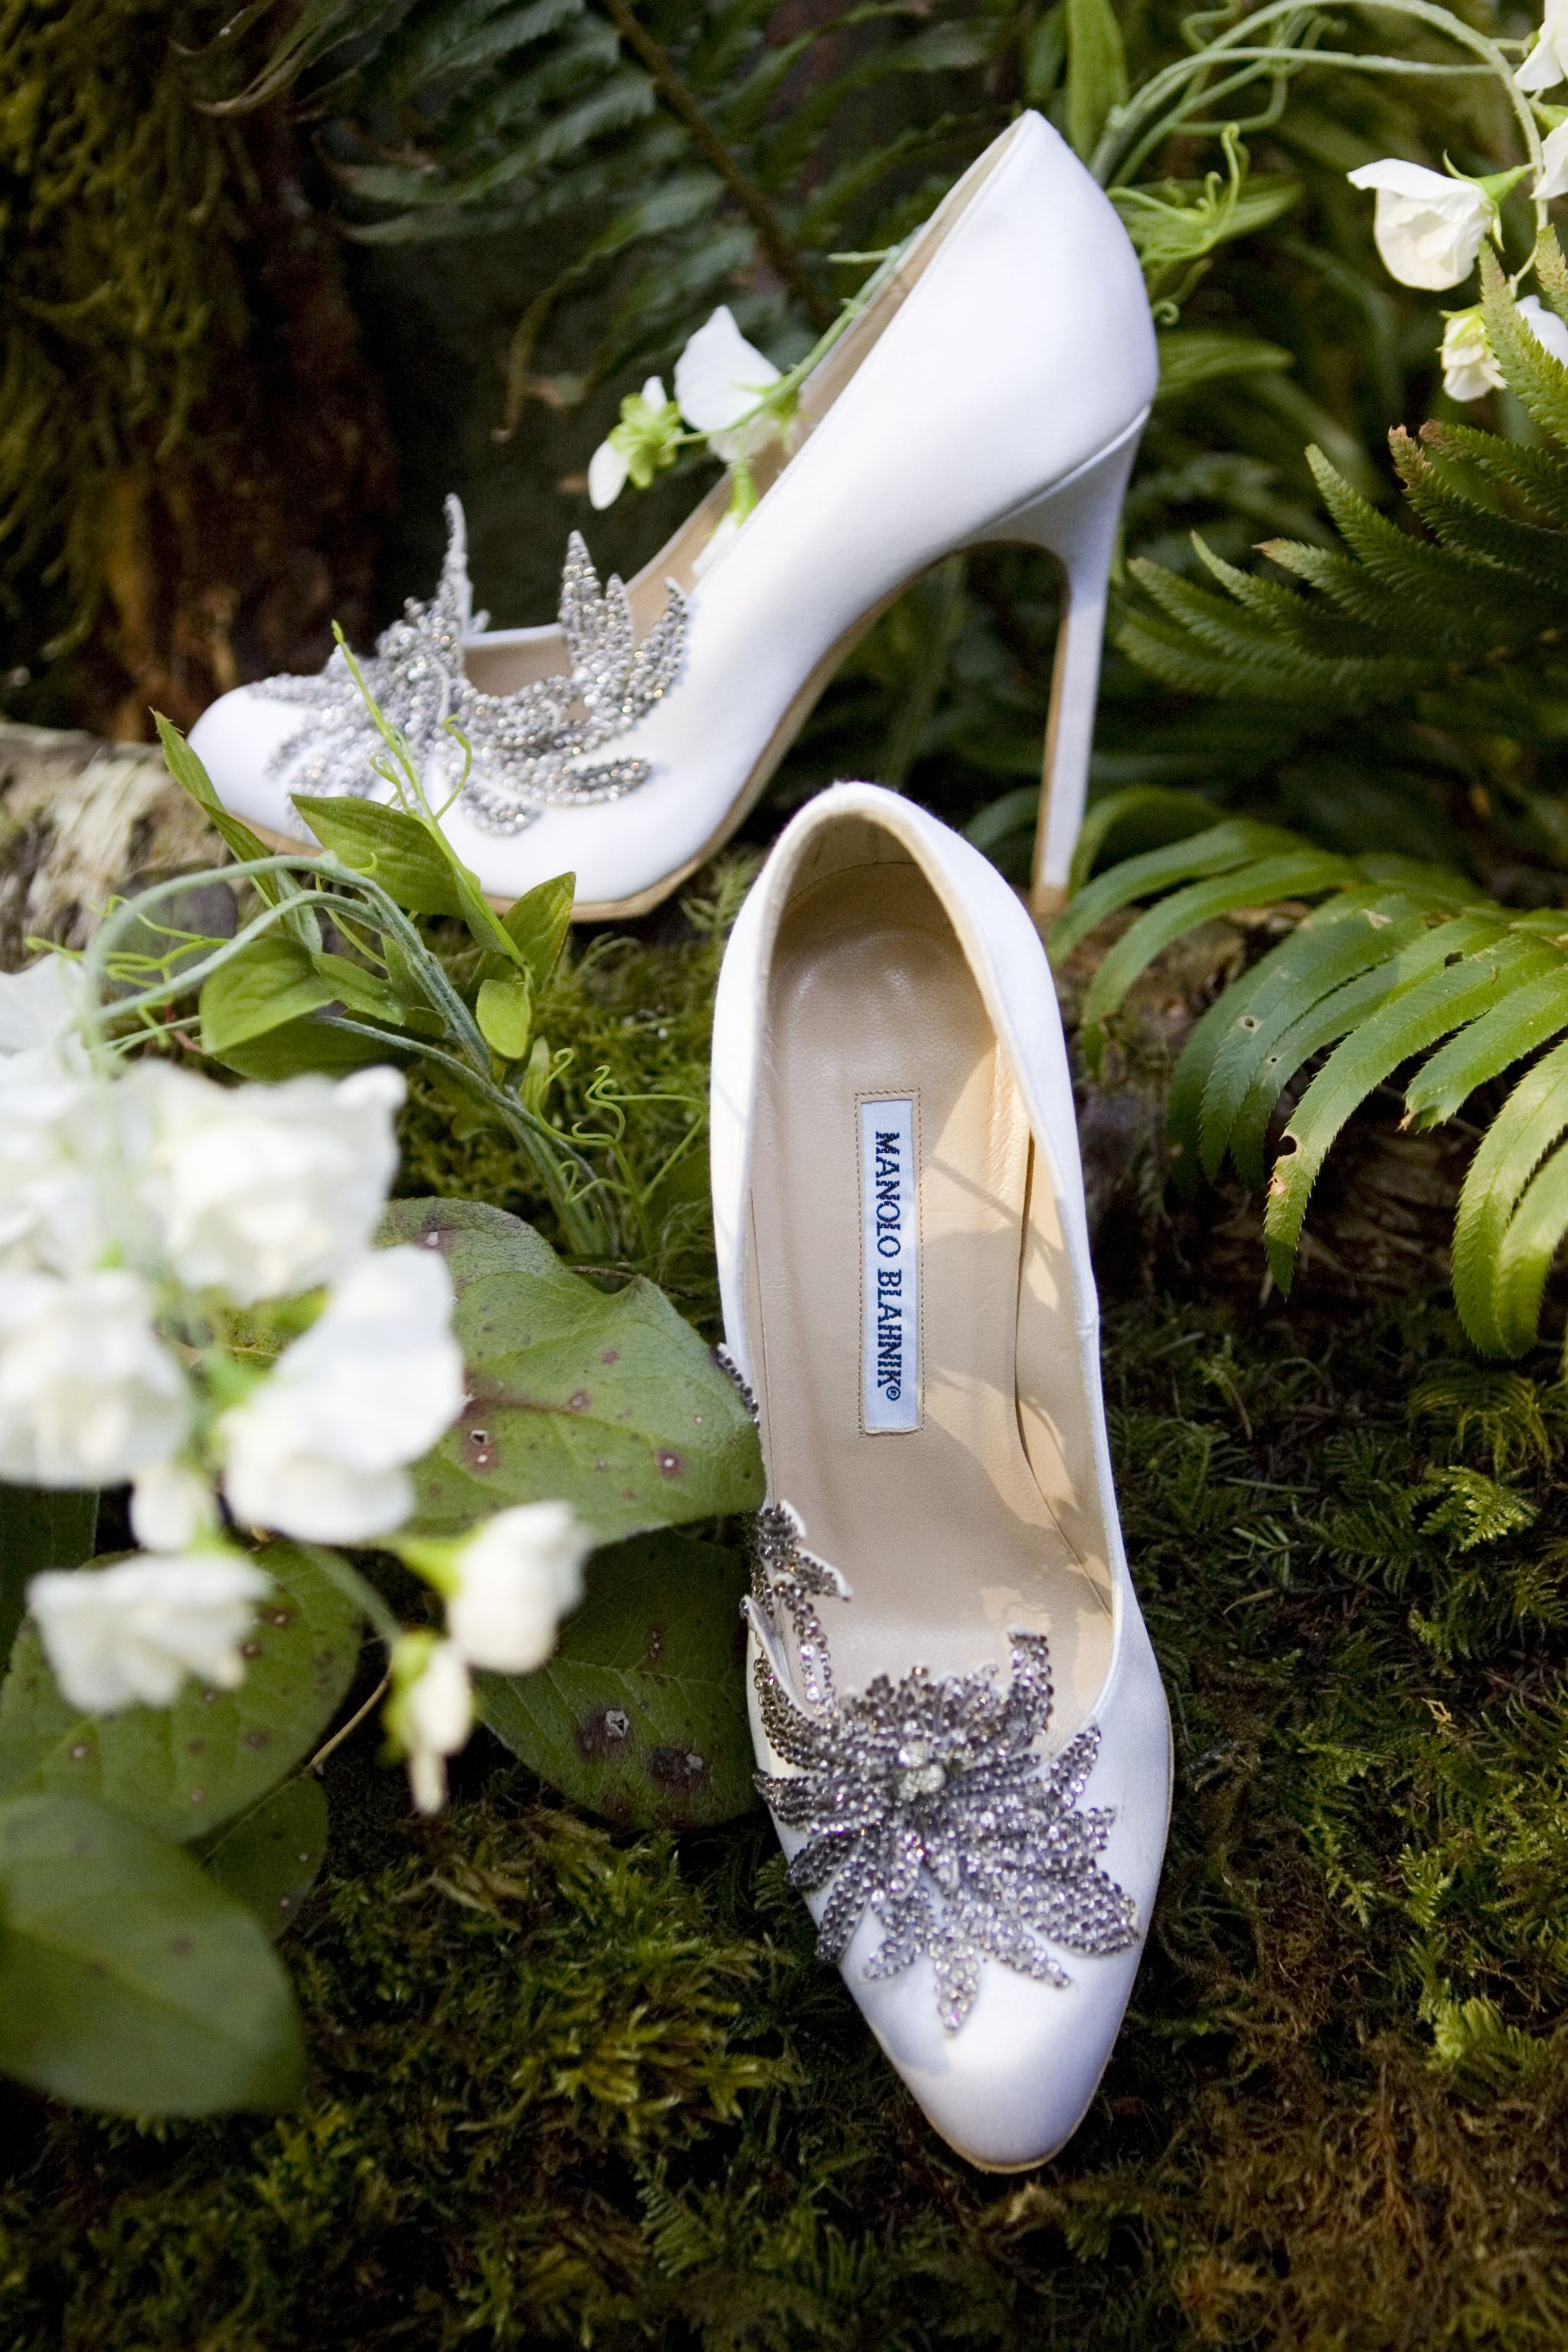 Manolo Blahnik Heels Designed for Kristen Stewart Bella Swan